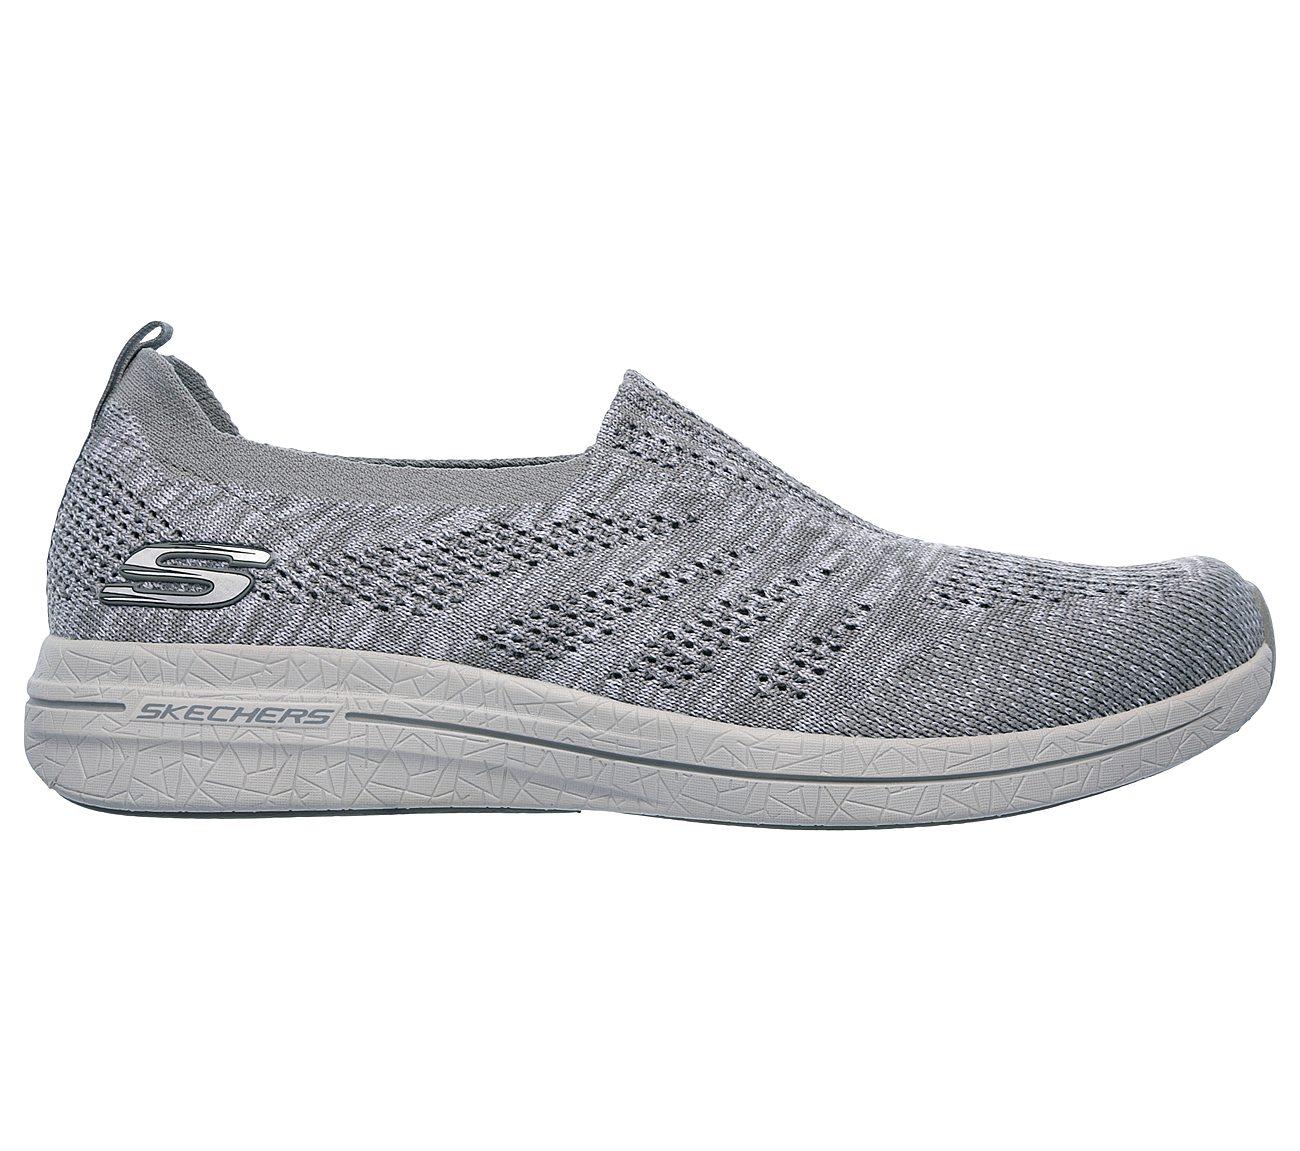 895f80d005532 Buy SKECHERS Burst 2.0 - Haviture Sport Shoes only $75.00